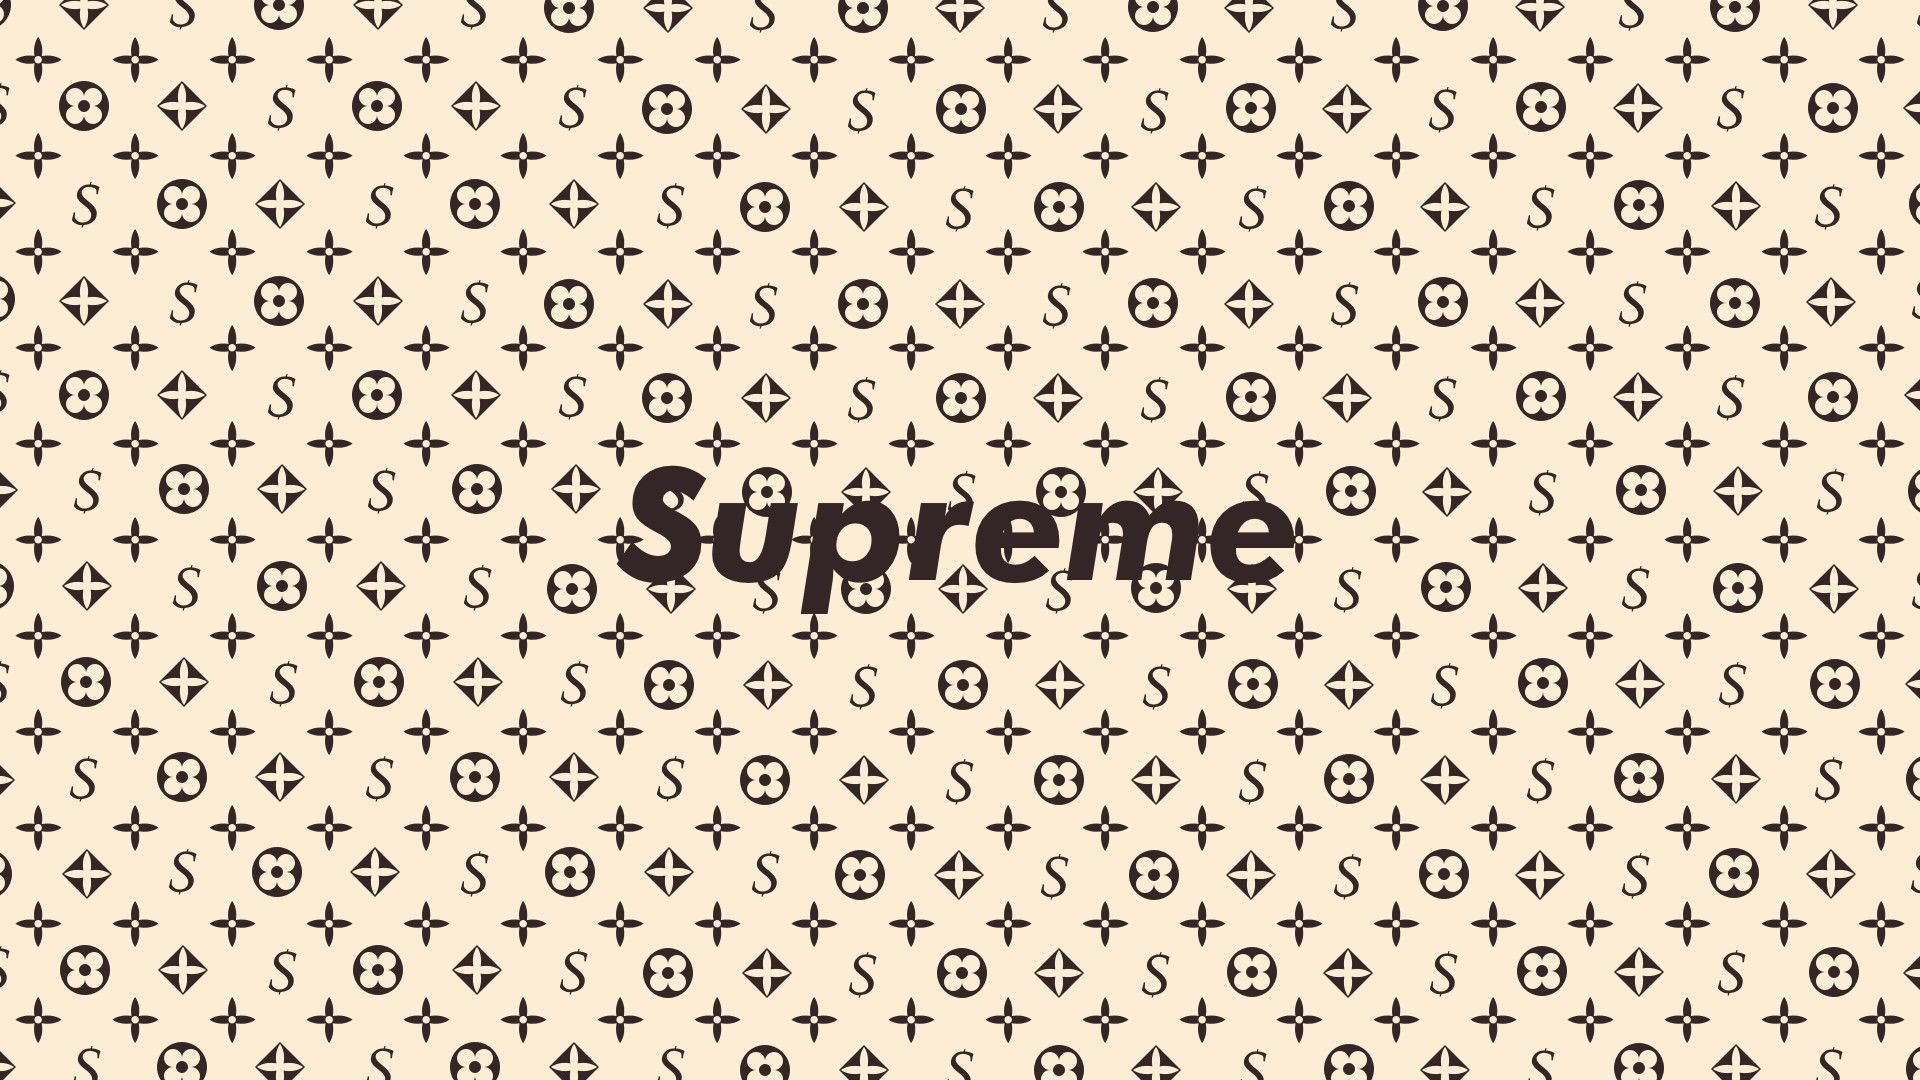 "1920x1080 Wallpaper Supreme X Lv Lovely Supreme X Louis Vuitton Wallpapers ...""> Download · 1280x1920 Supreme x Louis Vuitton wallpapers ..."